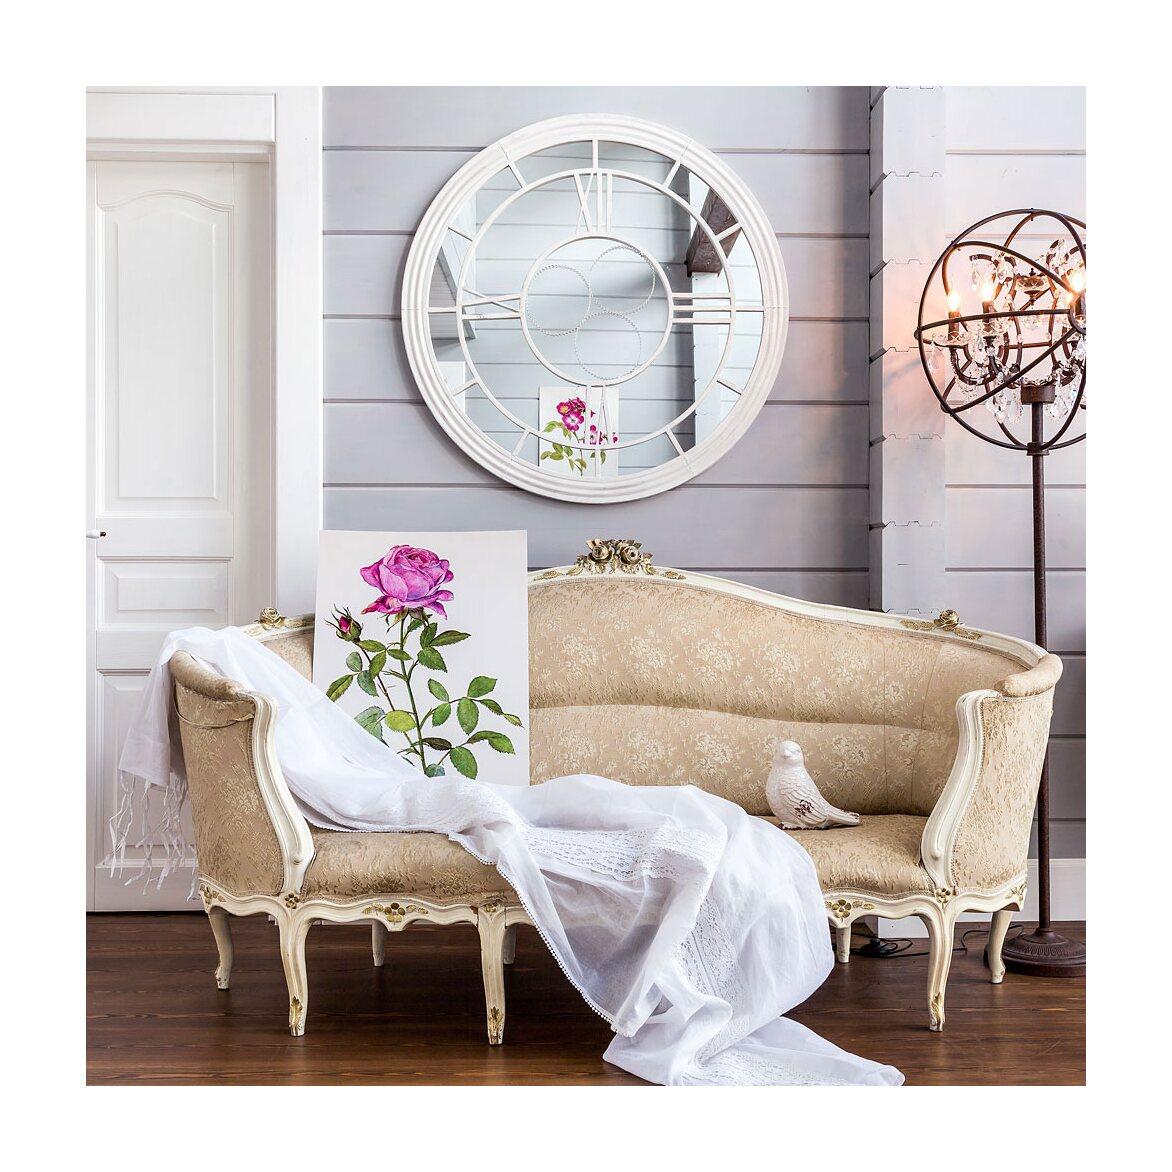 Настенное зеркало «Сен-Лазар» (белый антик) 3 | Настенные зеркала Kingsby